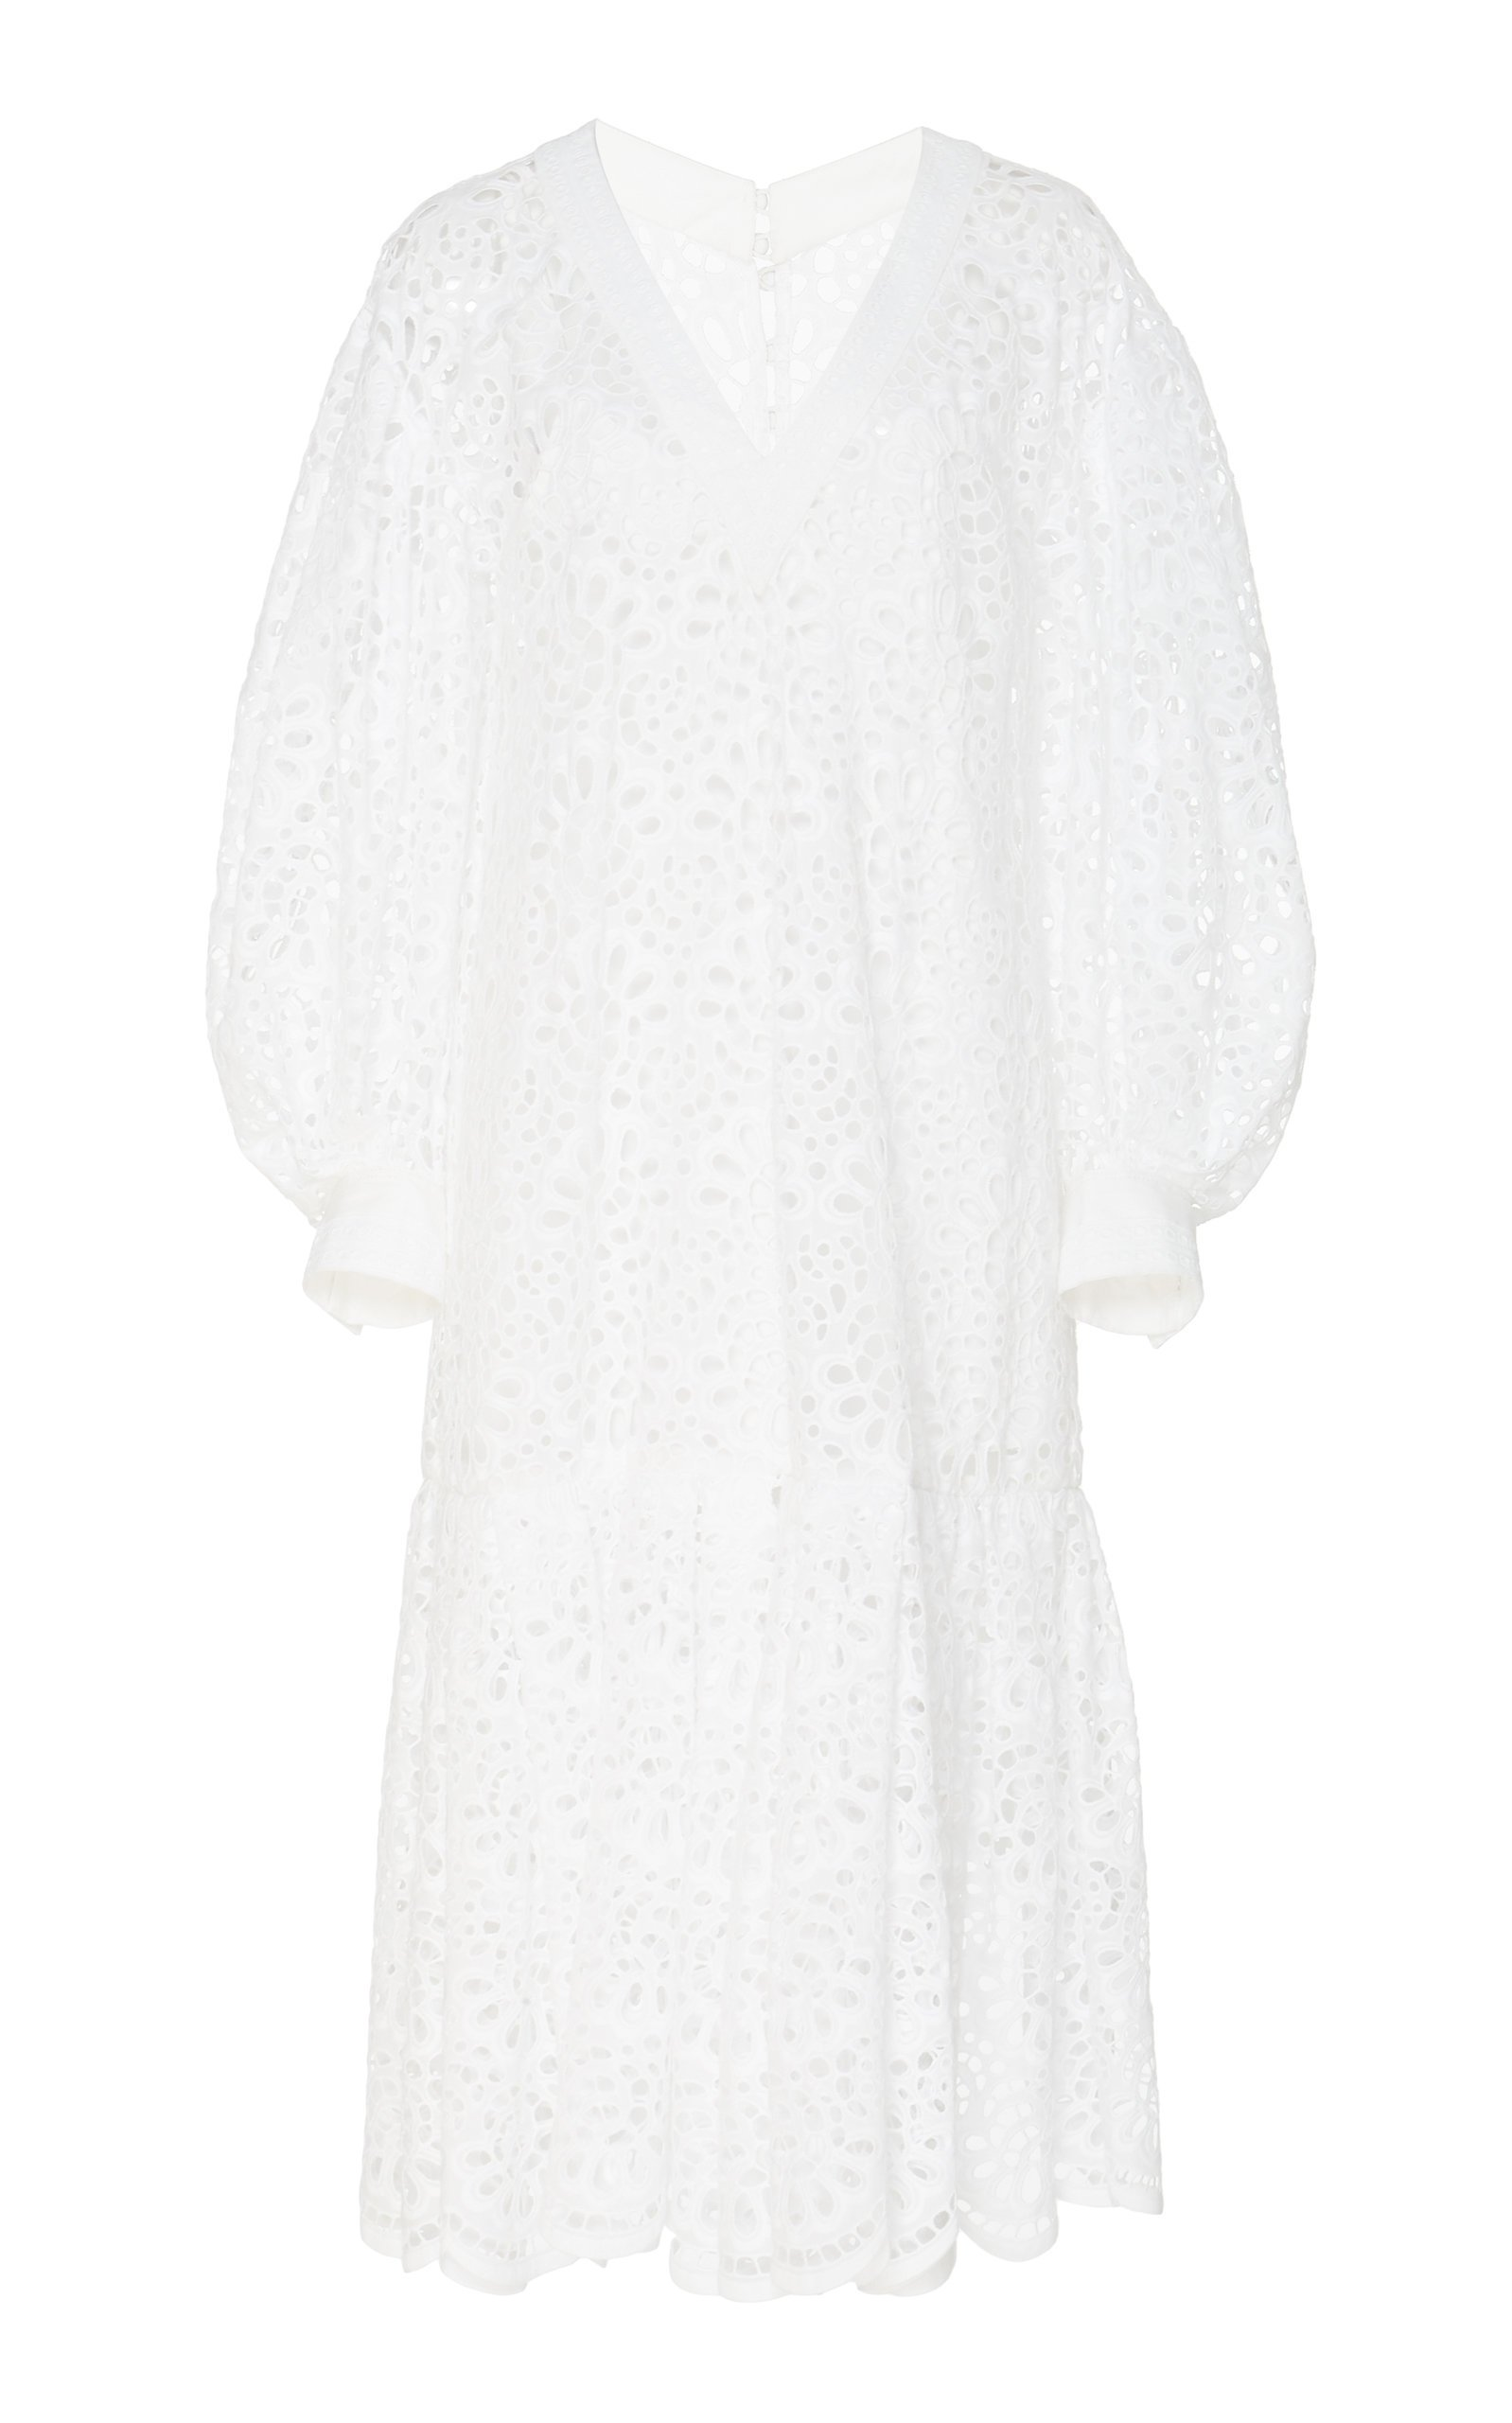 Carolina Herrera Broderie Anglaise Cotton Dress